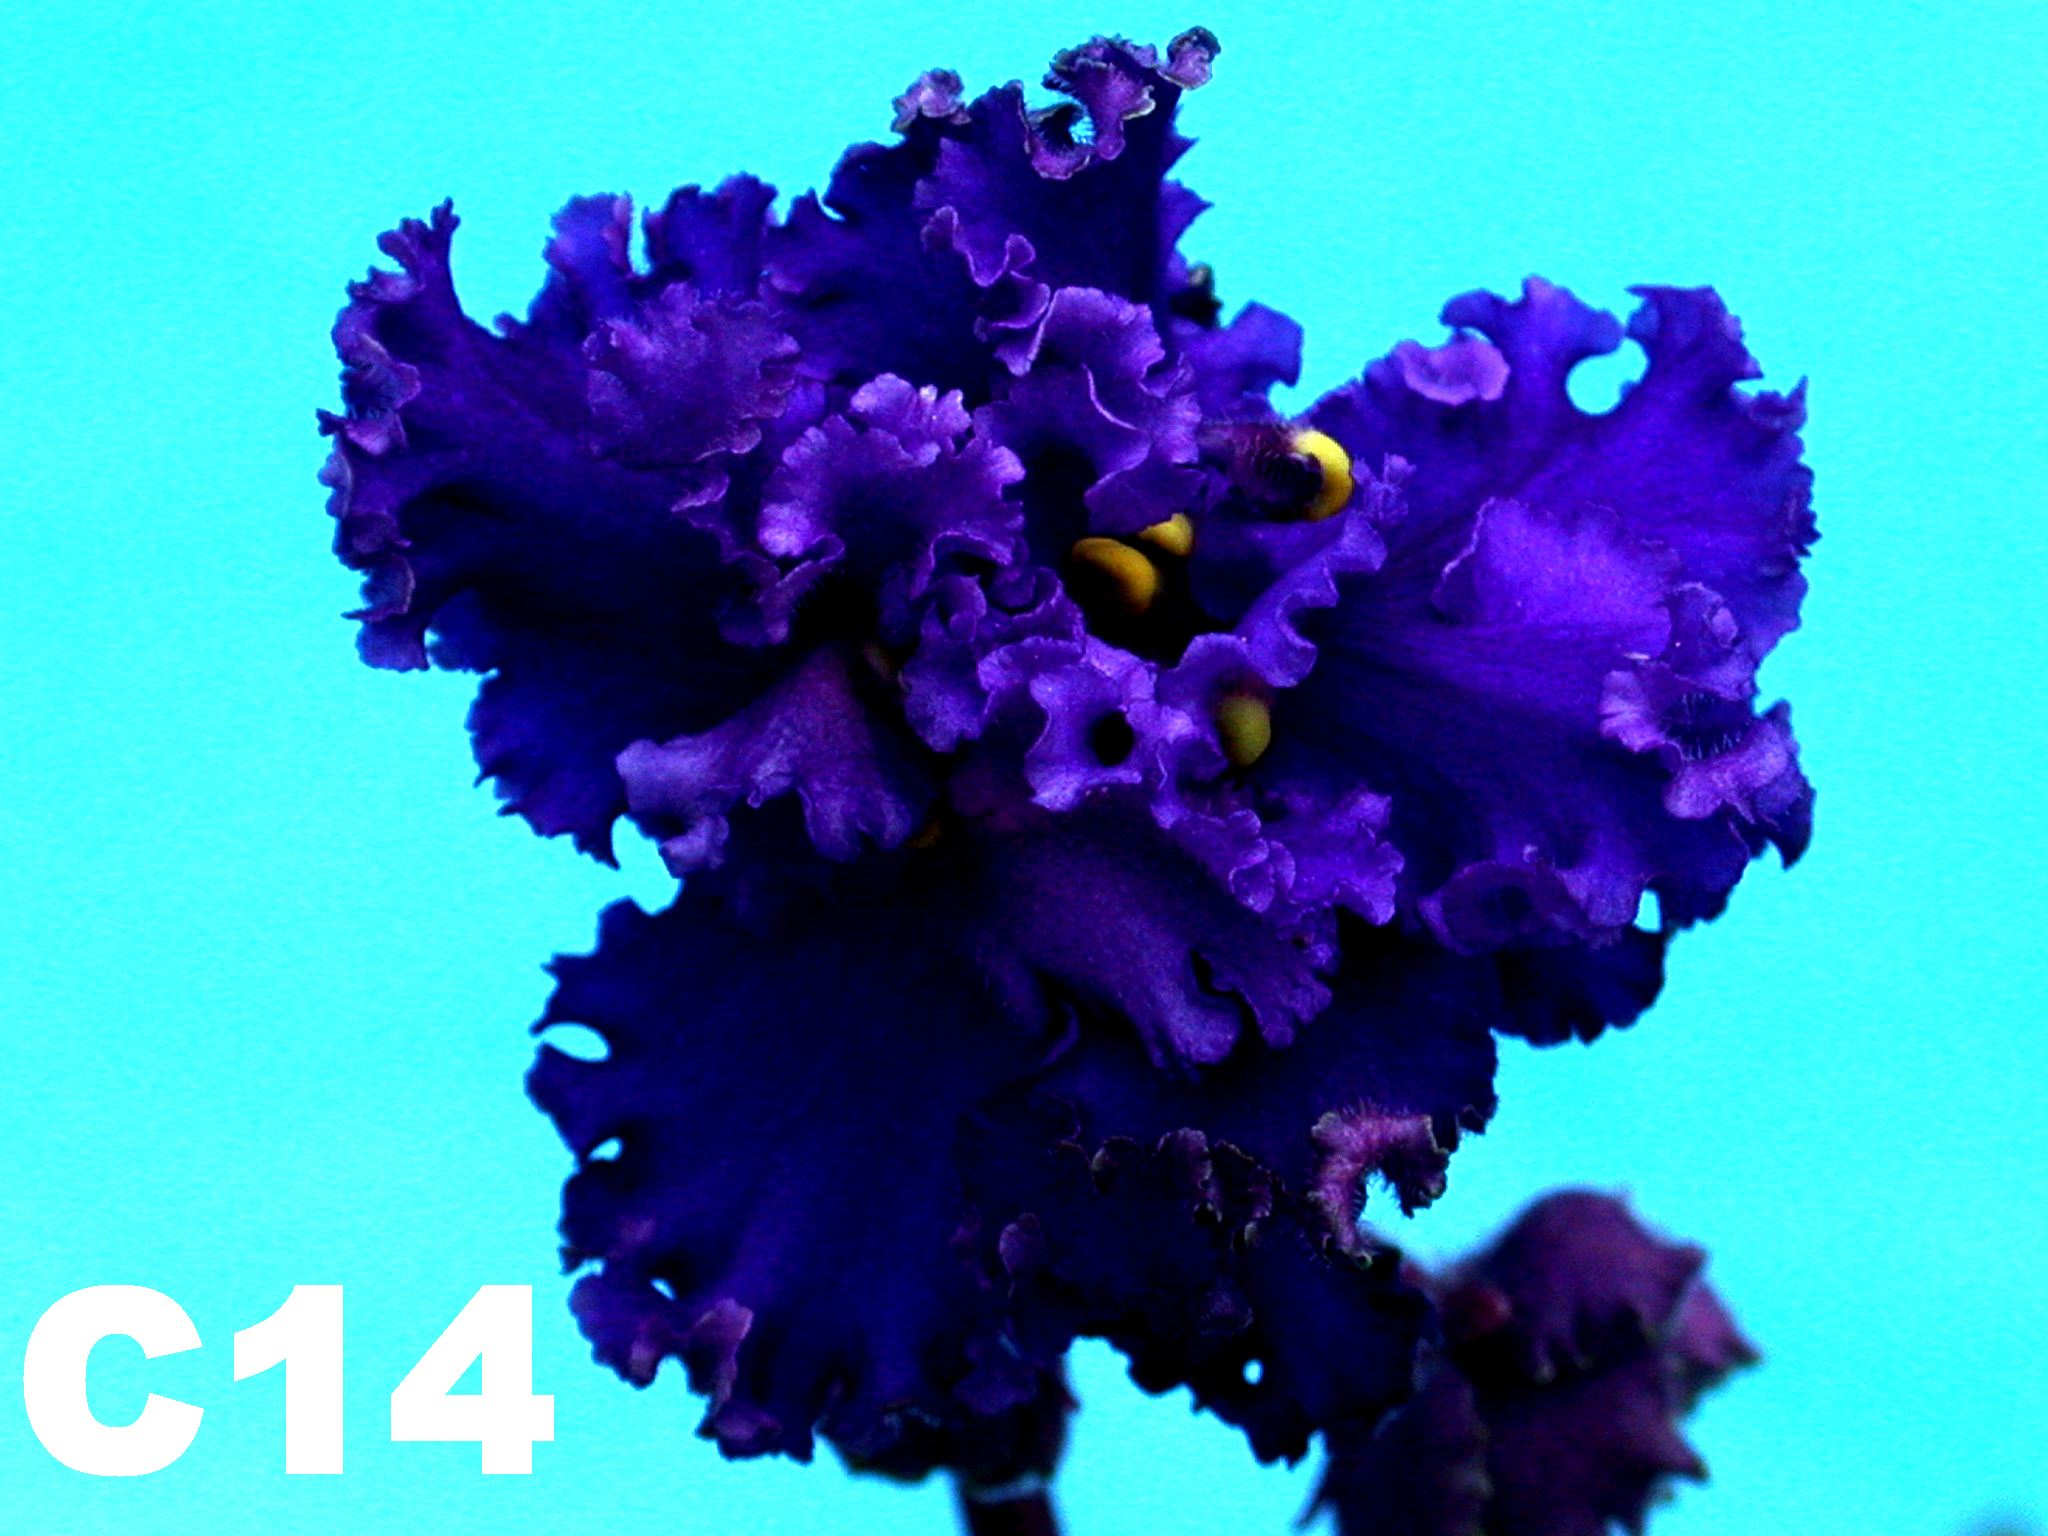 非洲紫羅蘭名錄 | African Violets Catalogue - C系列 C14